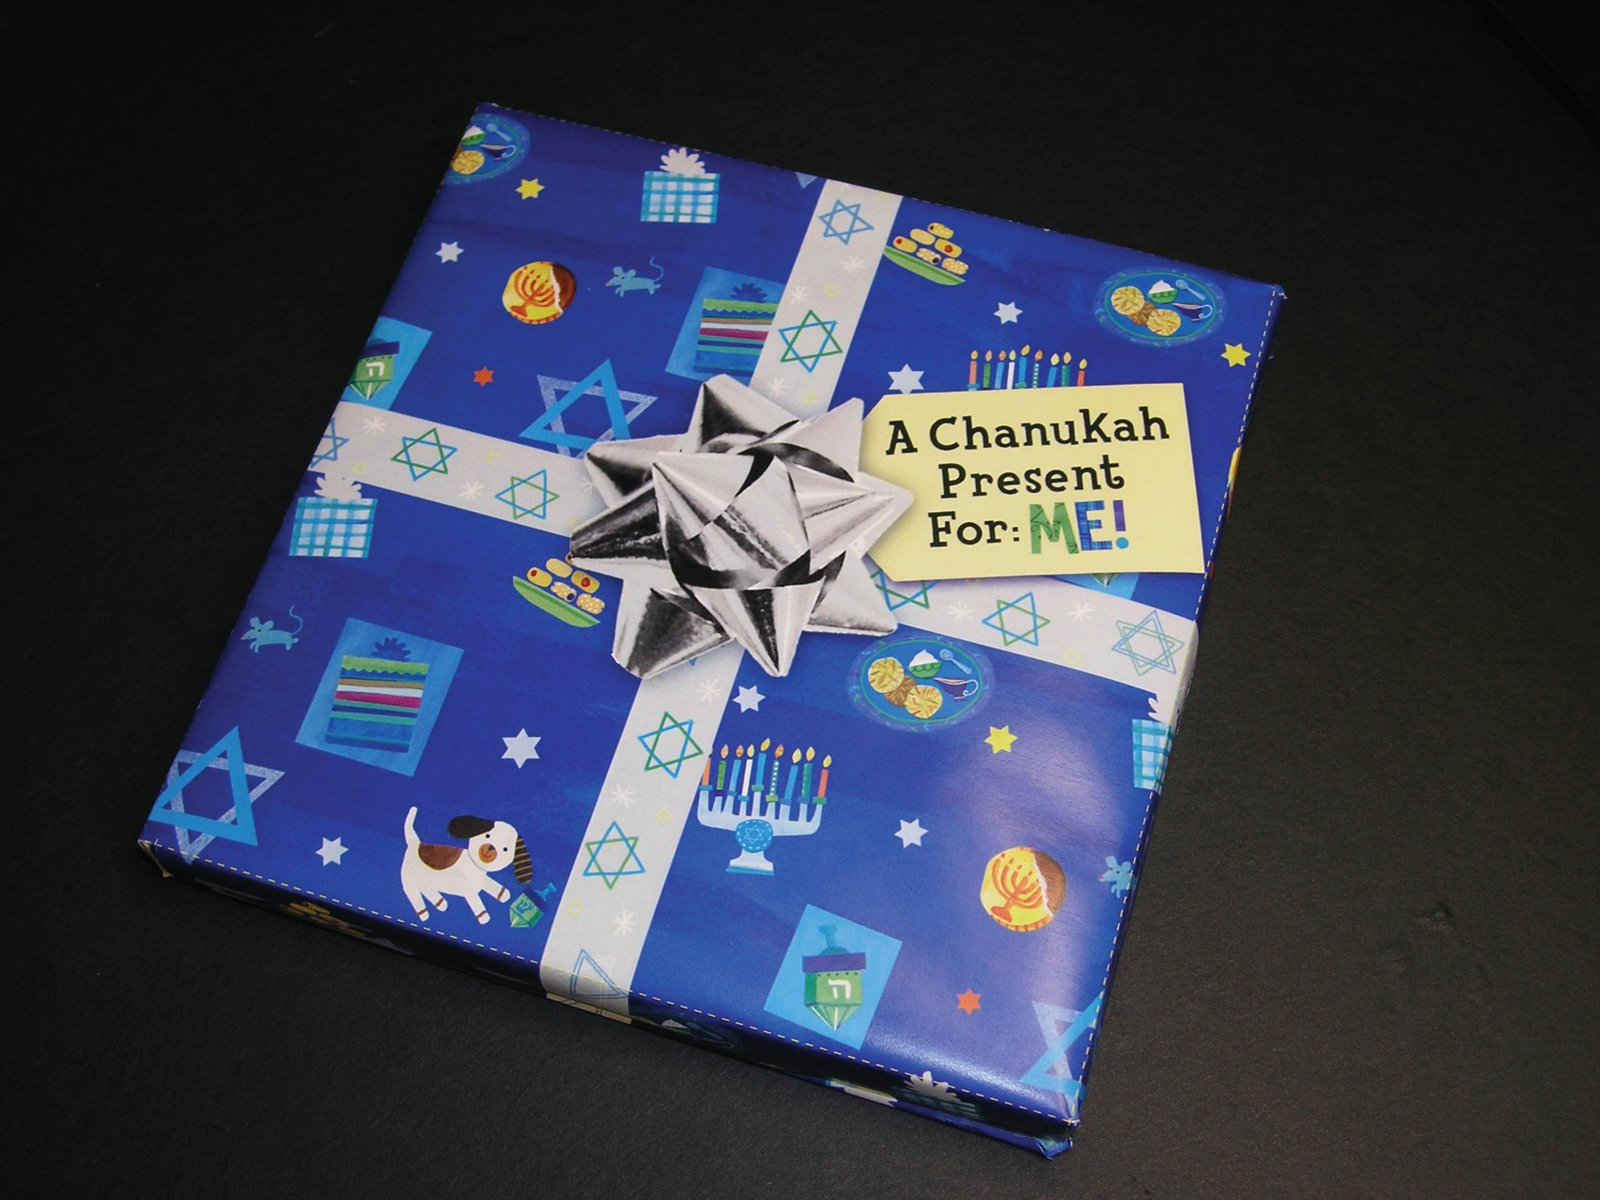 A Chanukah Present For: Me!